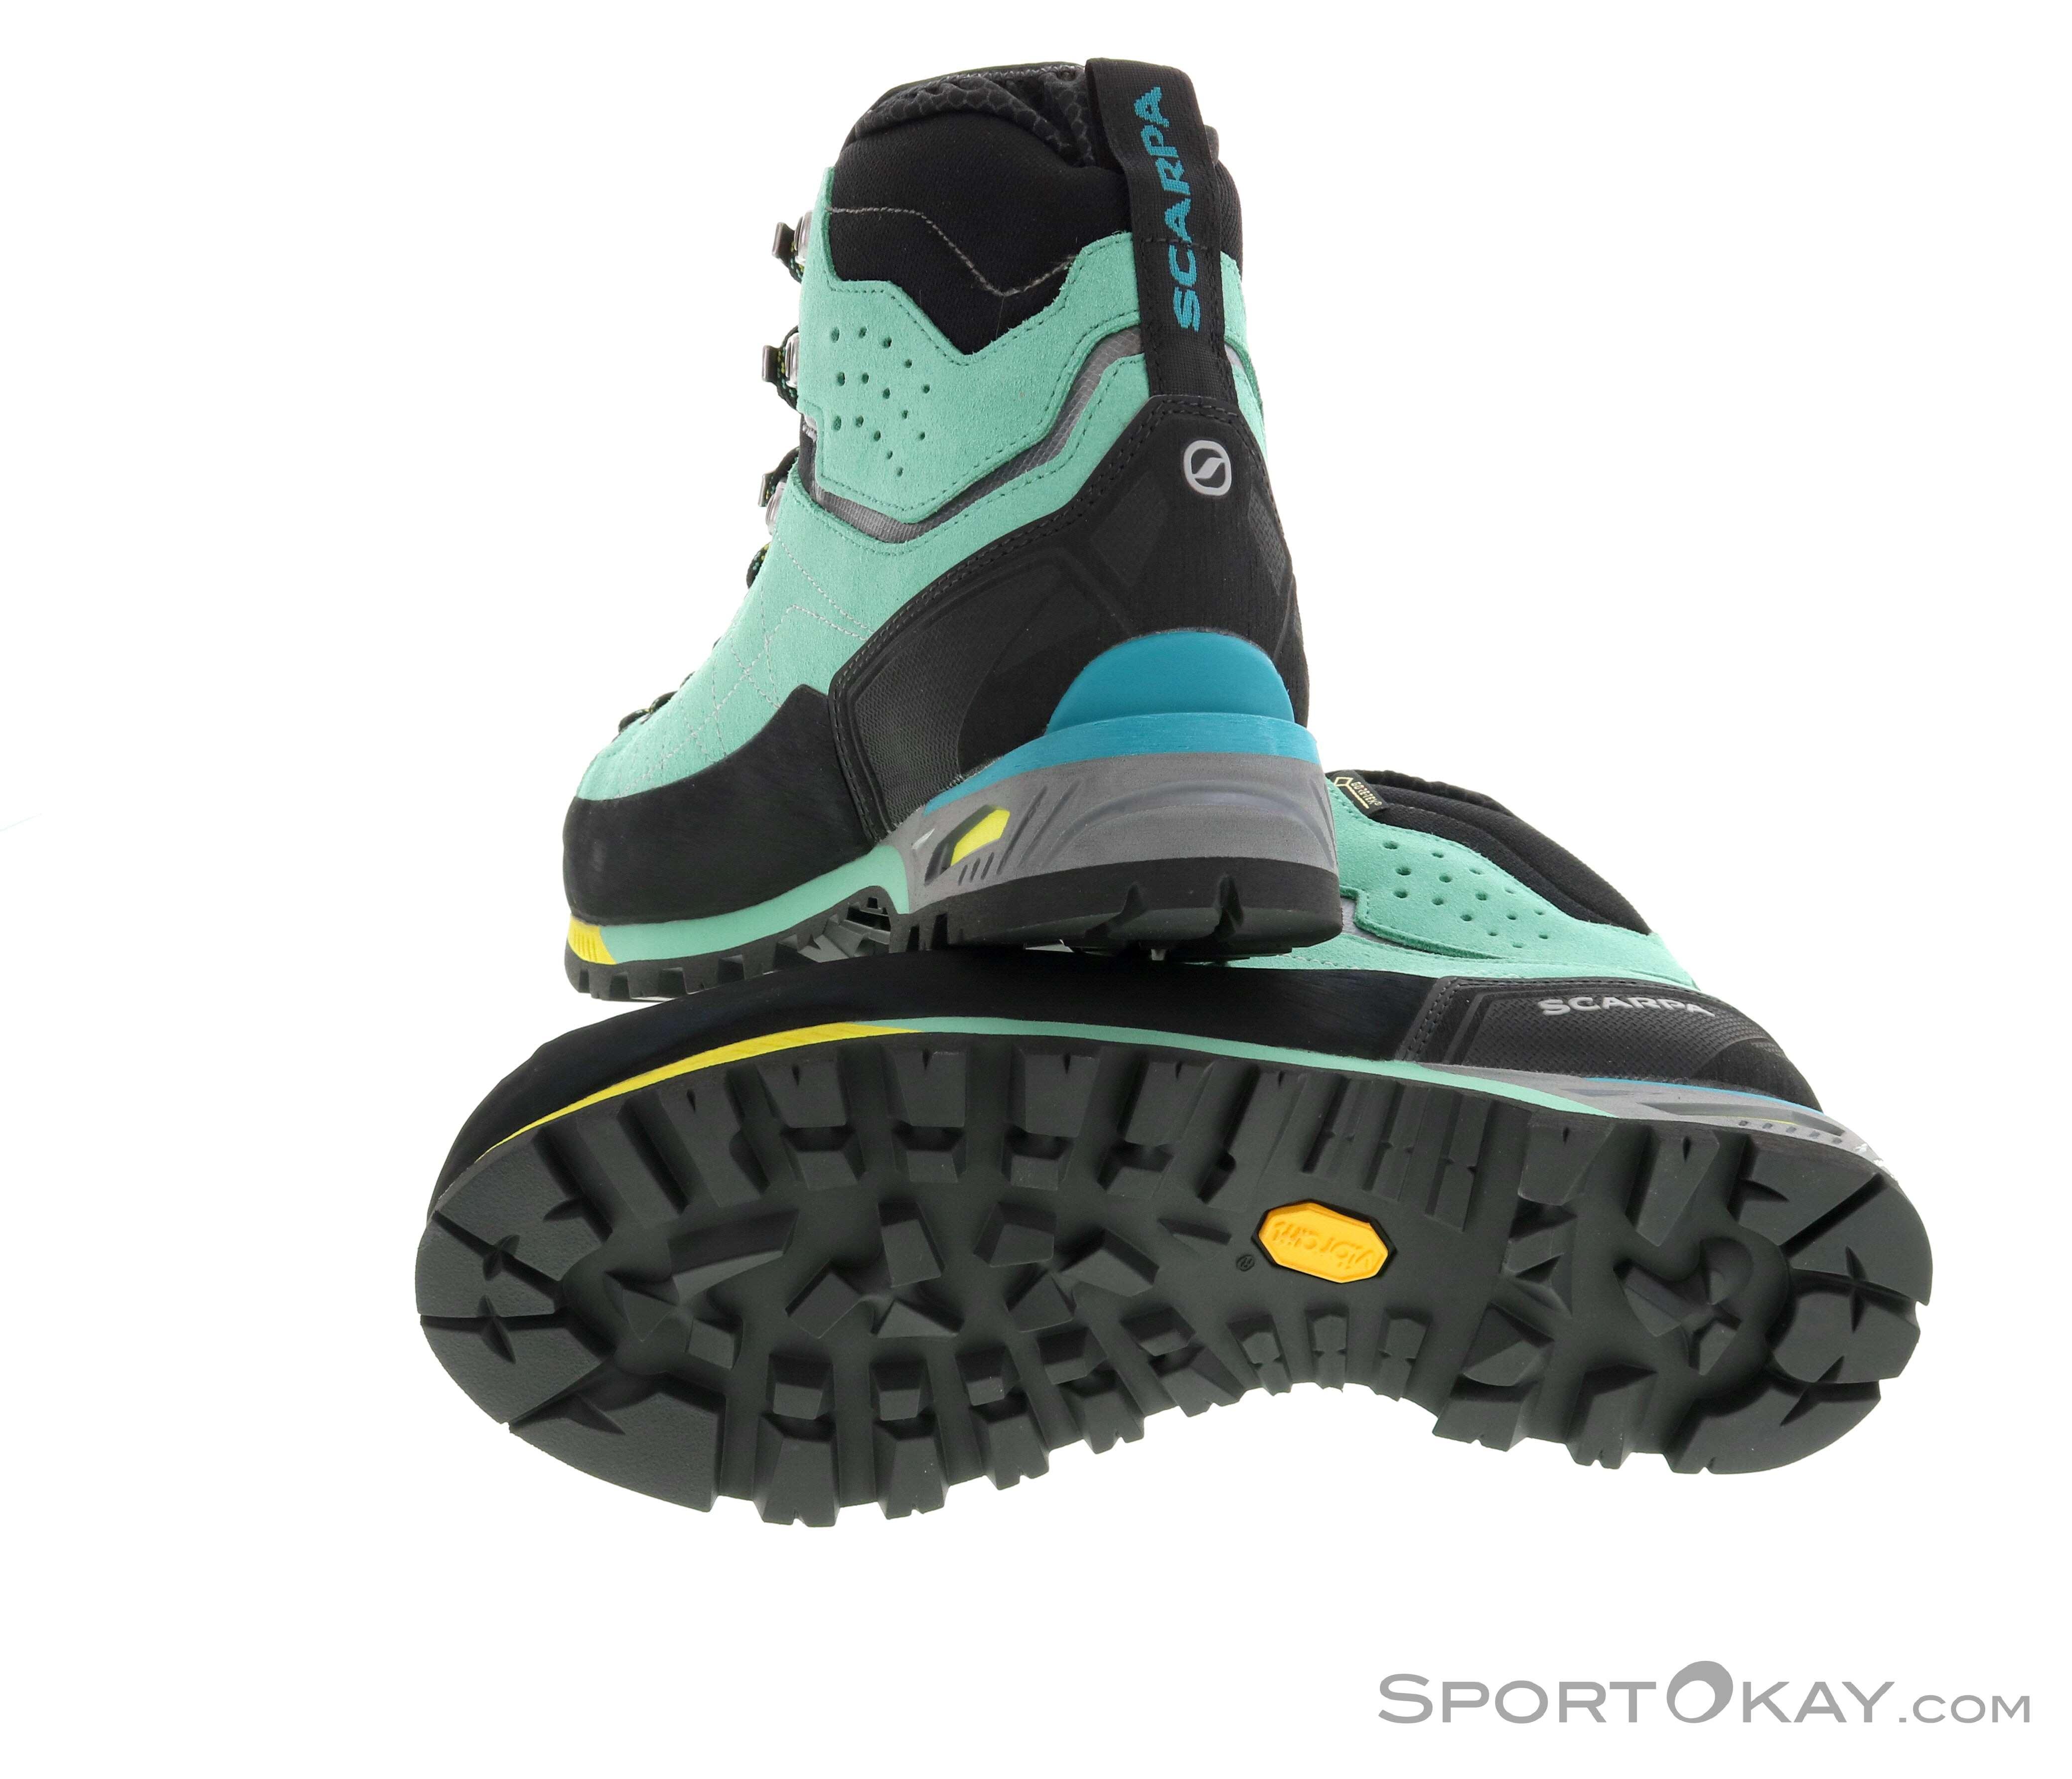 Scarpa Scarpa Zodiac Tech GTX Womens Mountaineering Boots Gore Tex